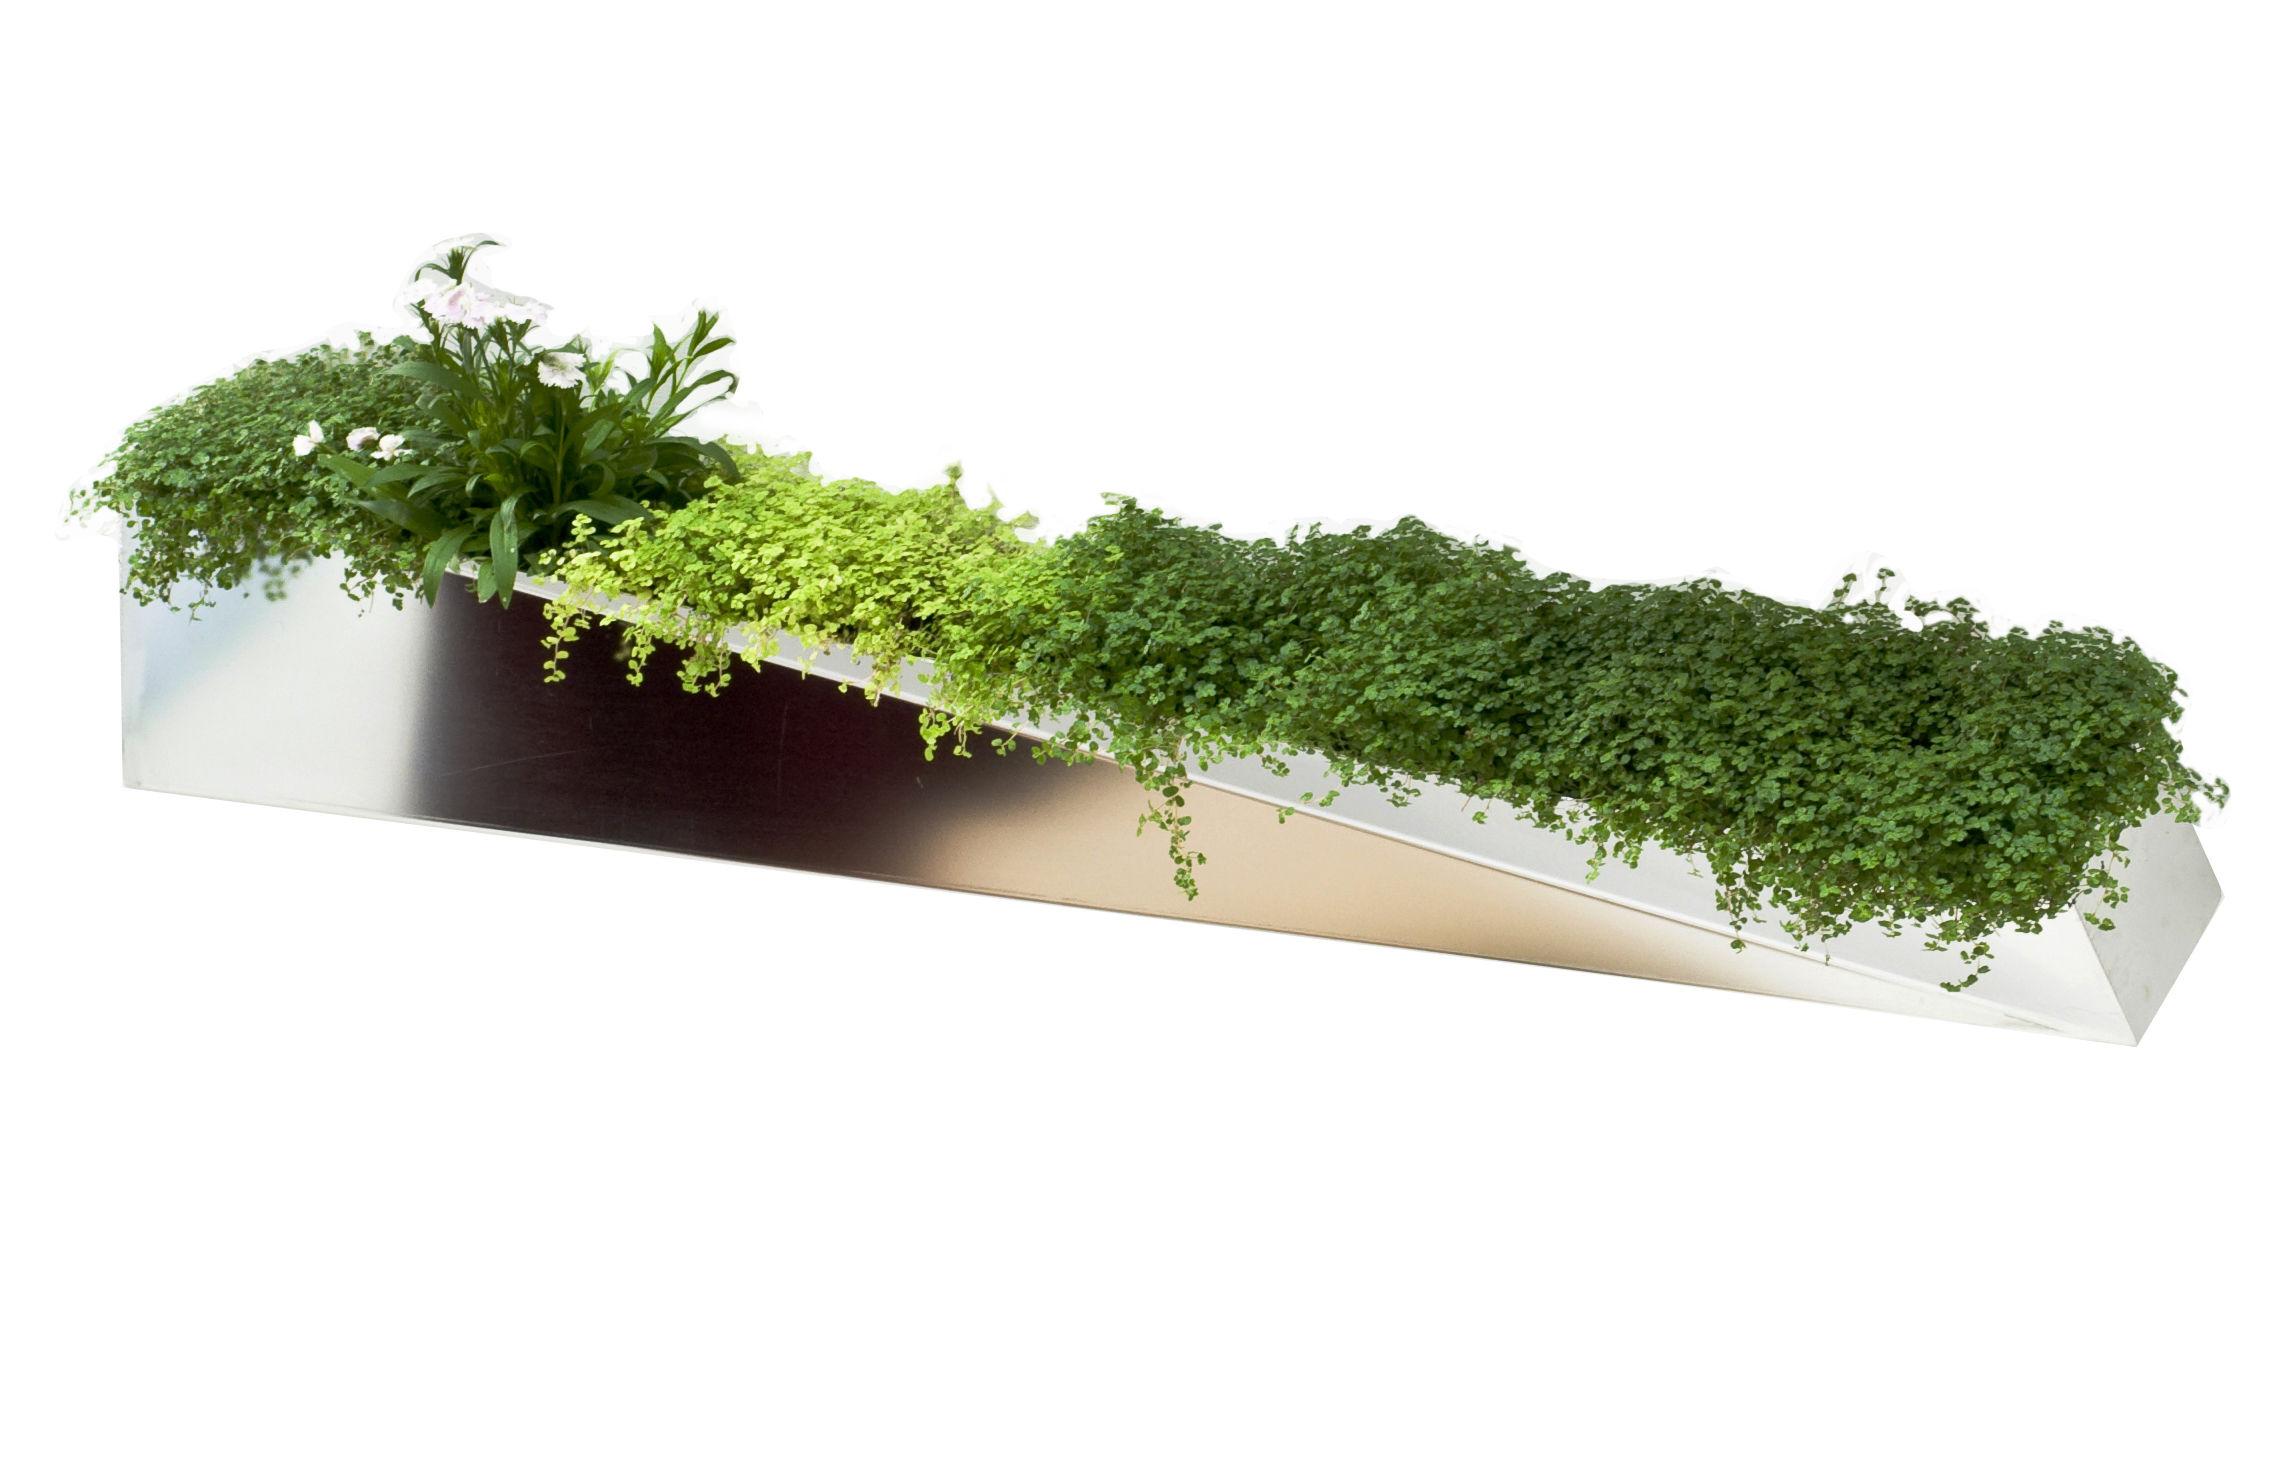 miroir en herbe wand blumentopf f r die wand edelstahl. Black Bedroom Furniture Sets. Home Design Ideas